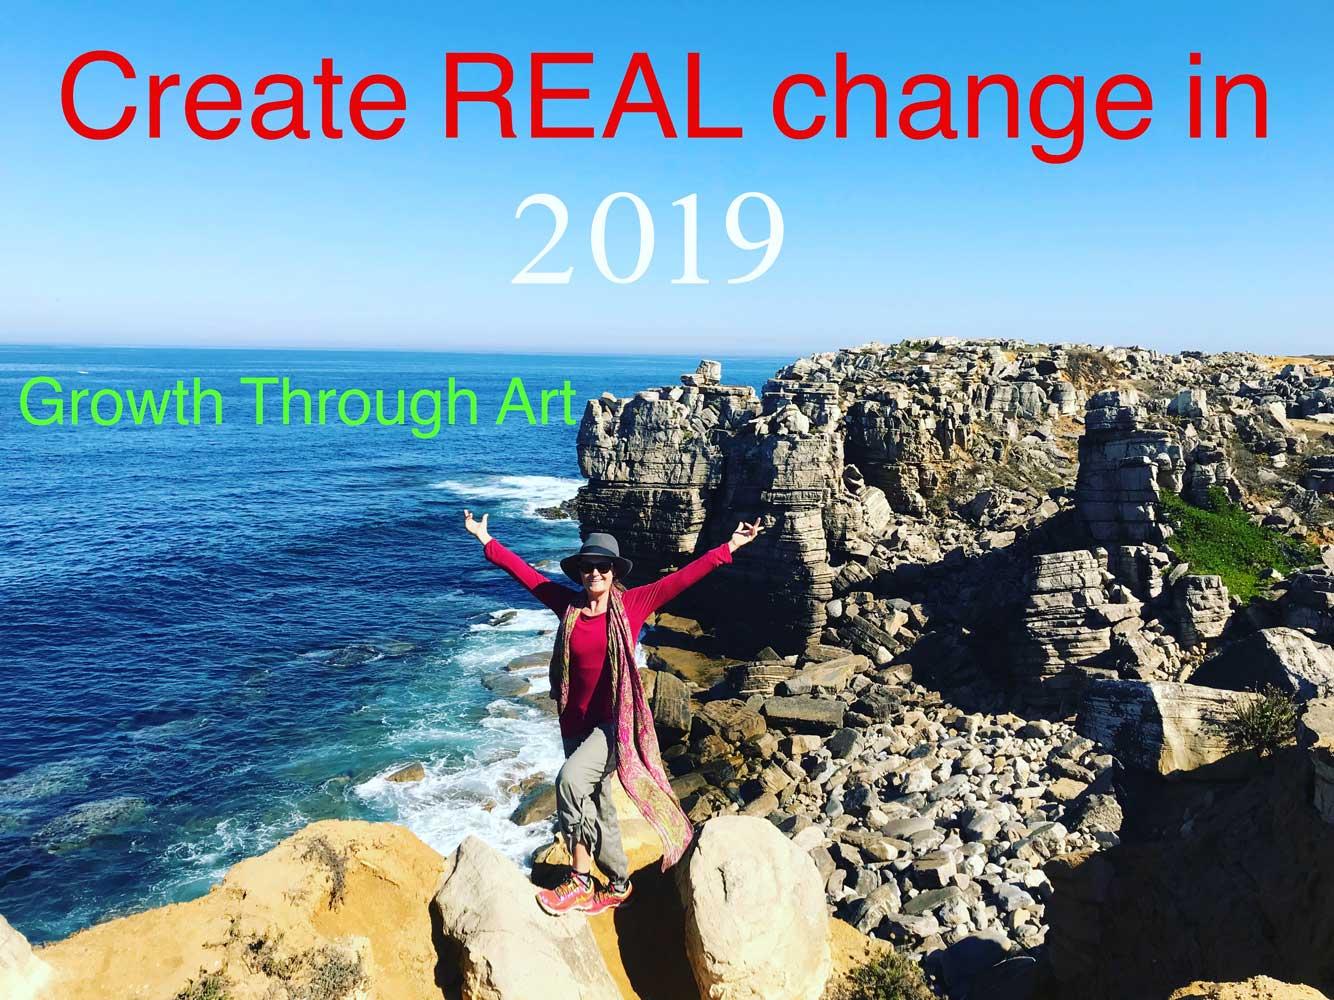 2019 Growth Through Art Adventure Tours